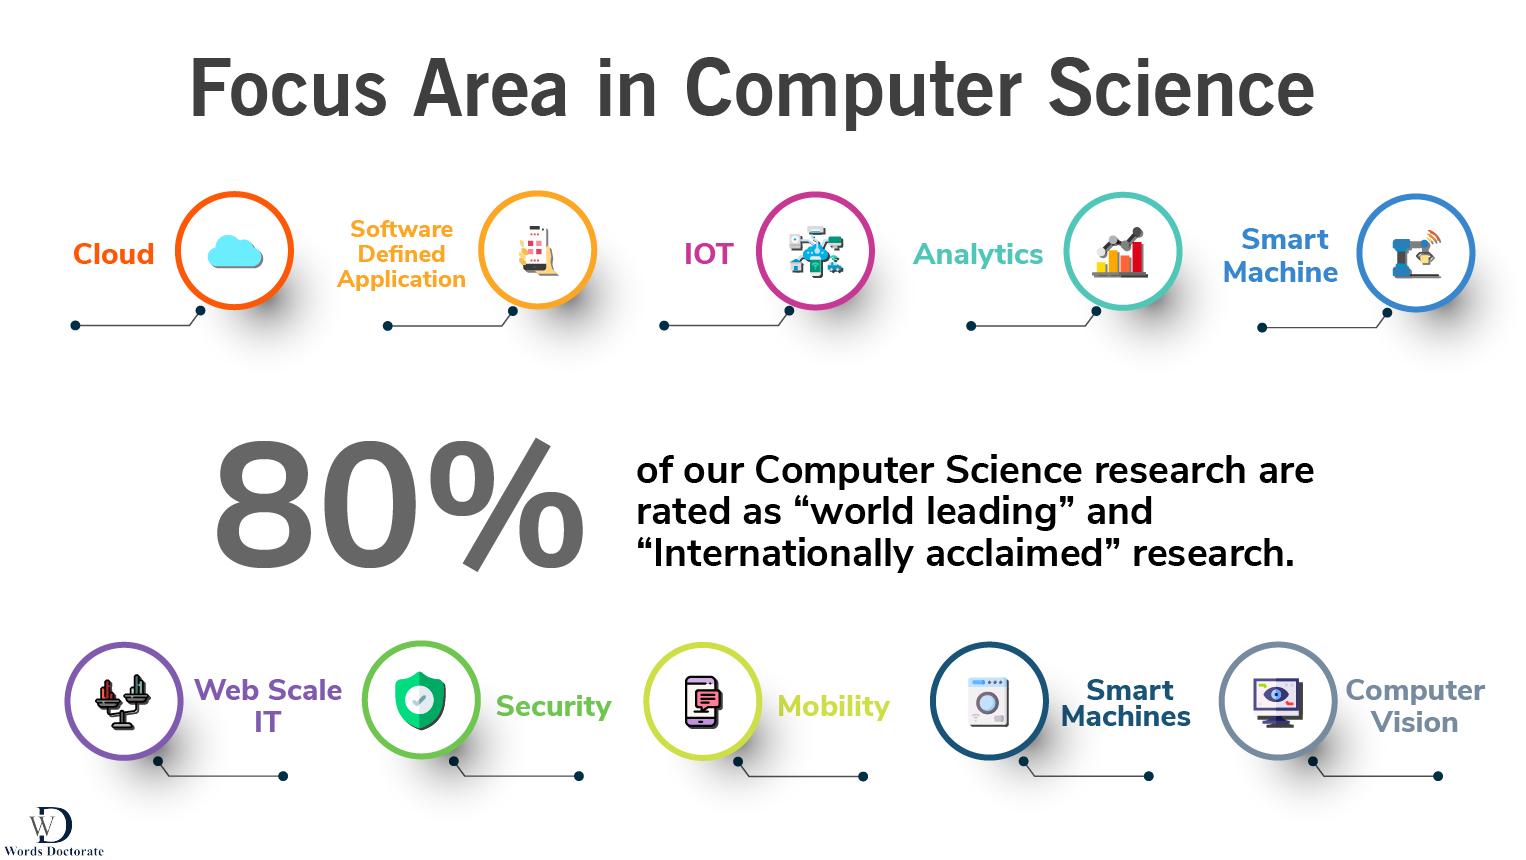 Focus Area in Computer Science